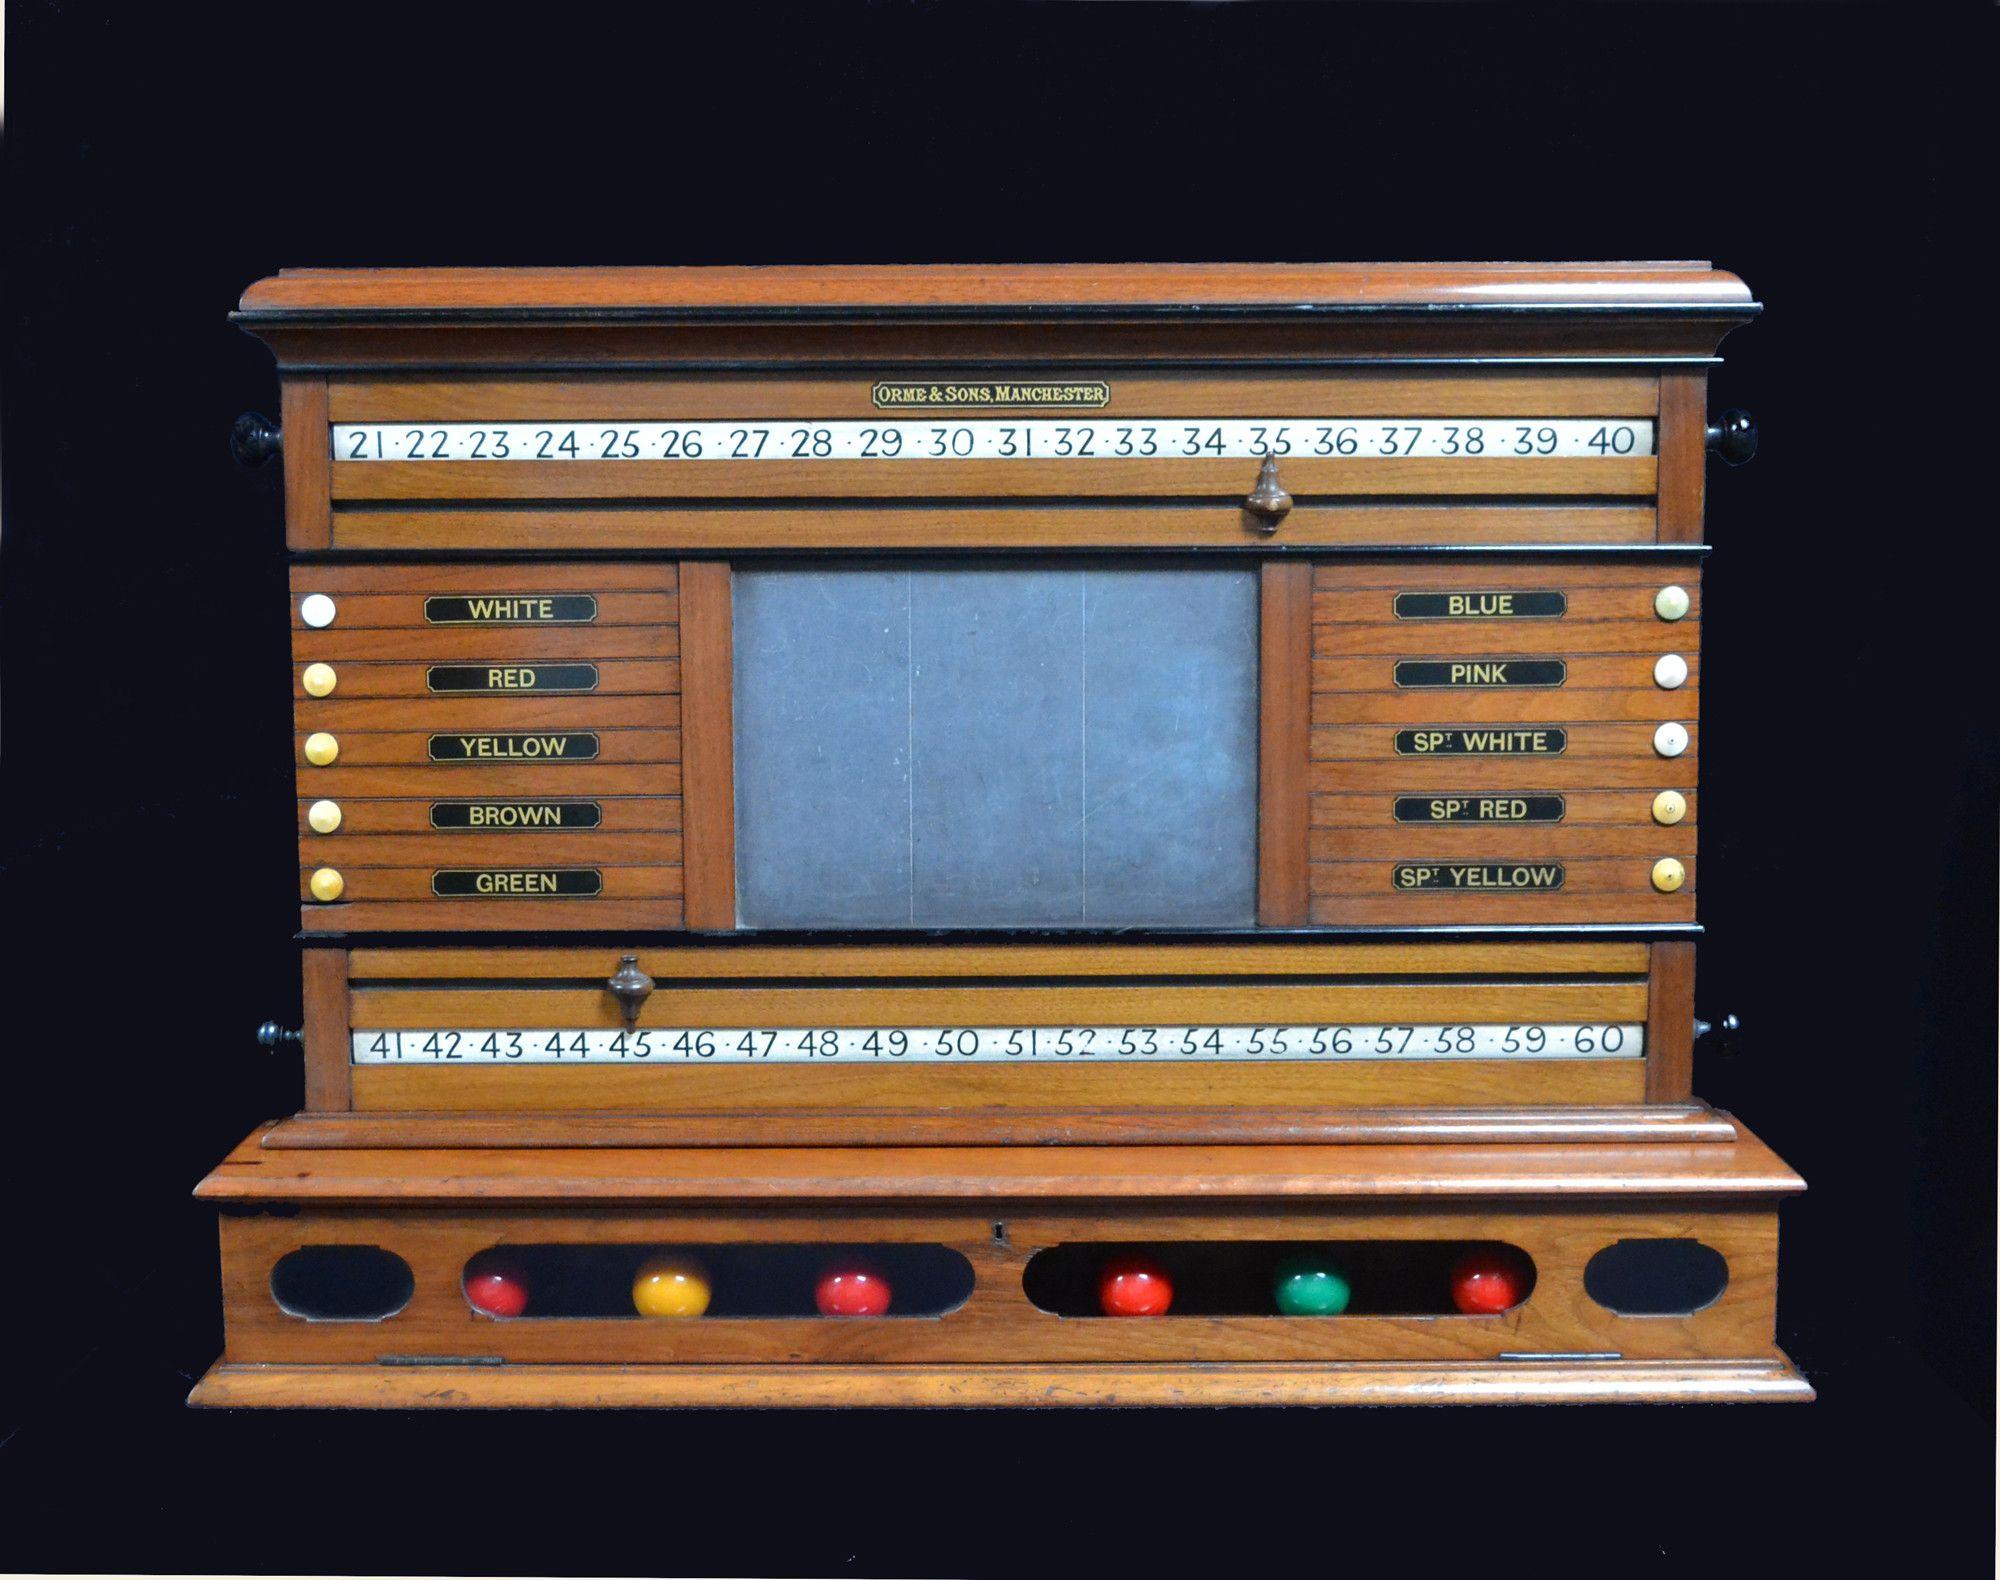 A Walnut Antique Billiard Snooker scoring